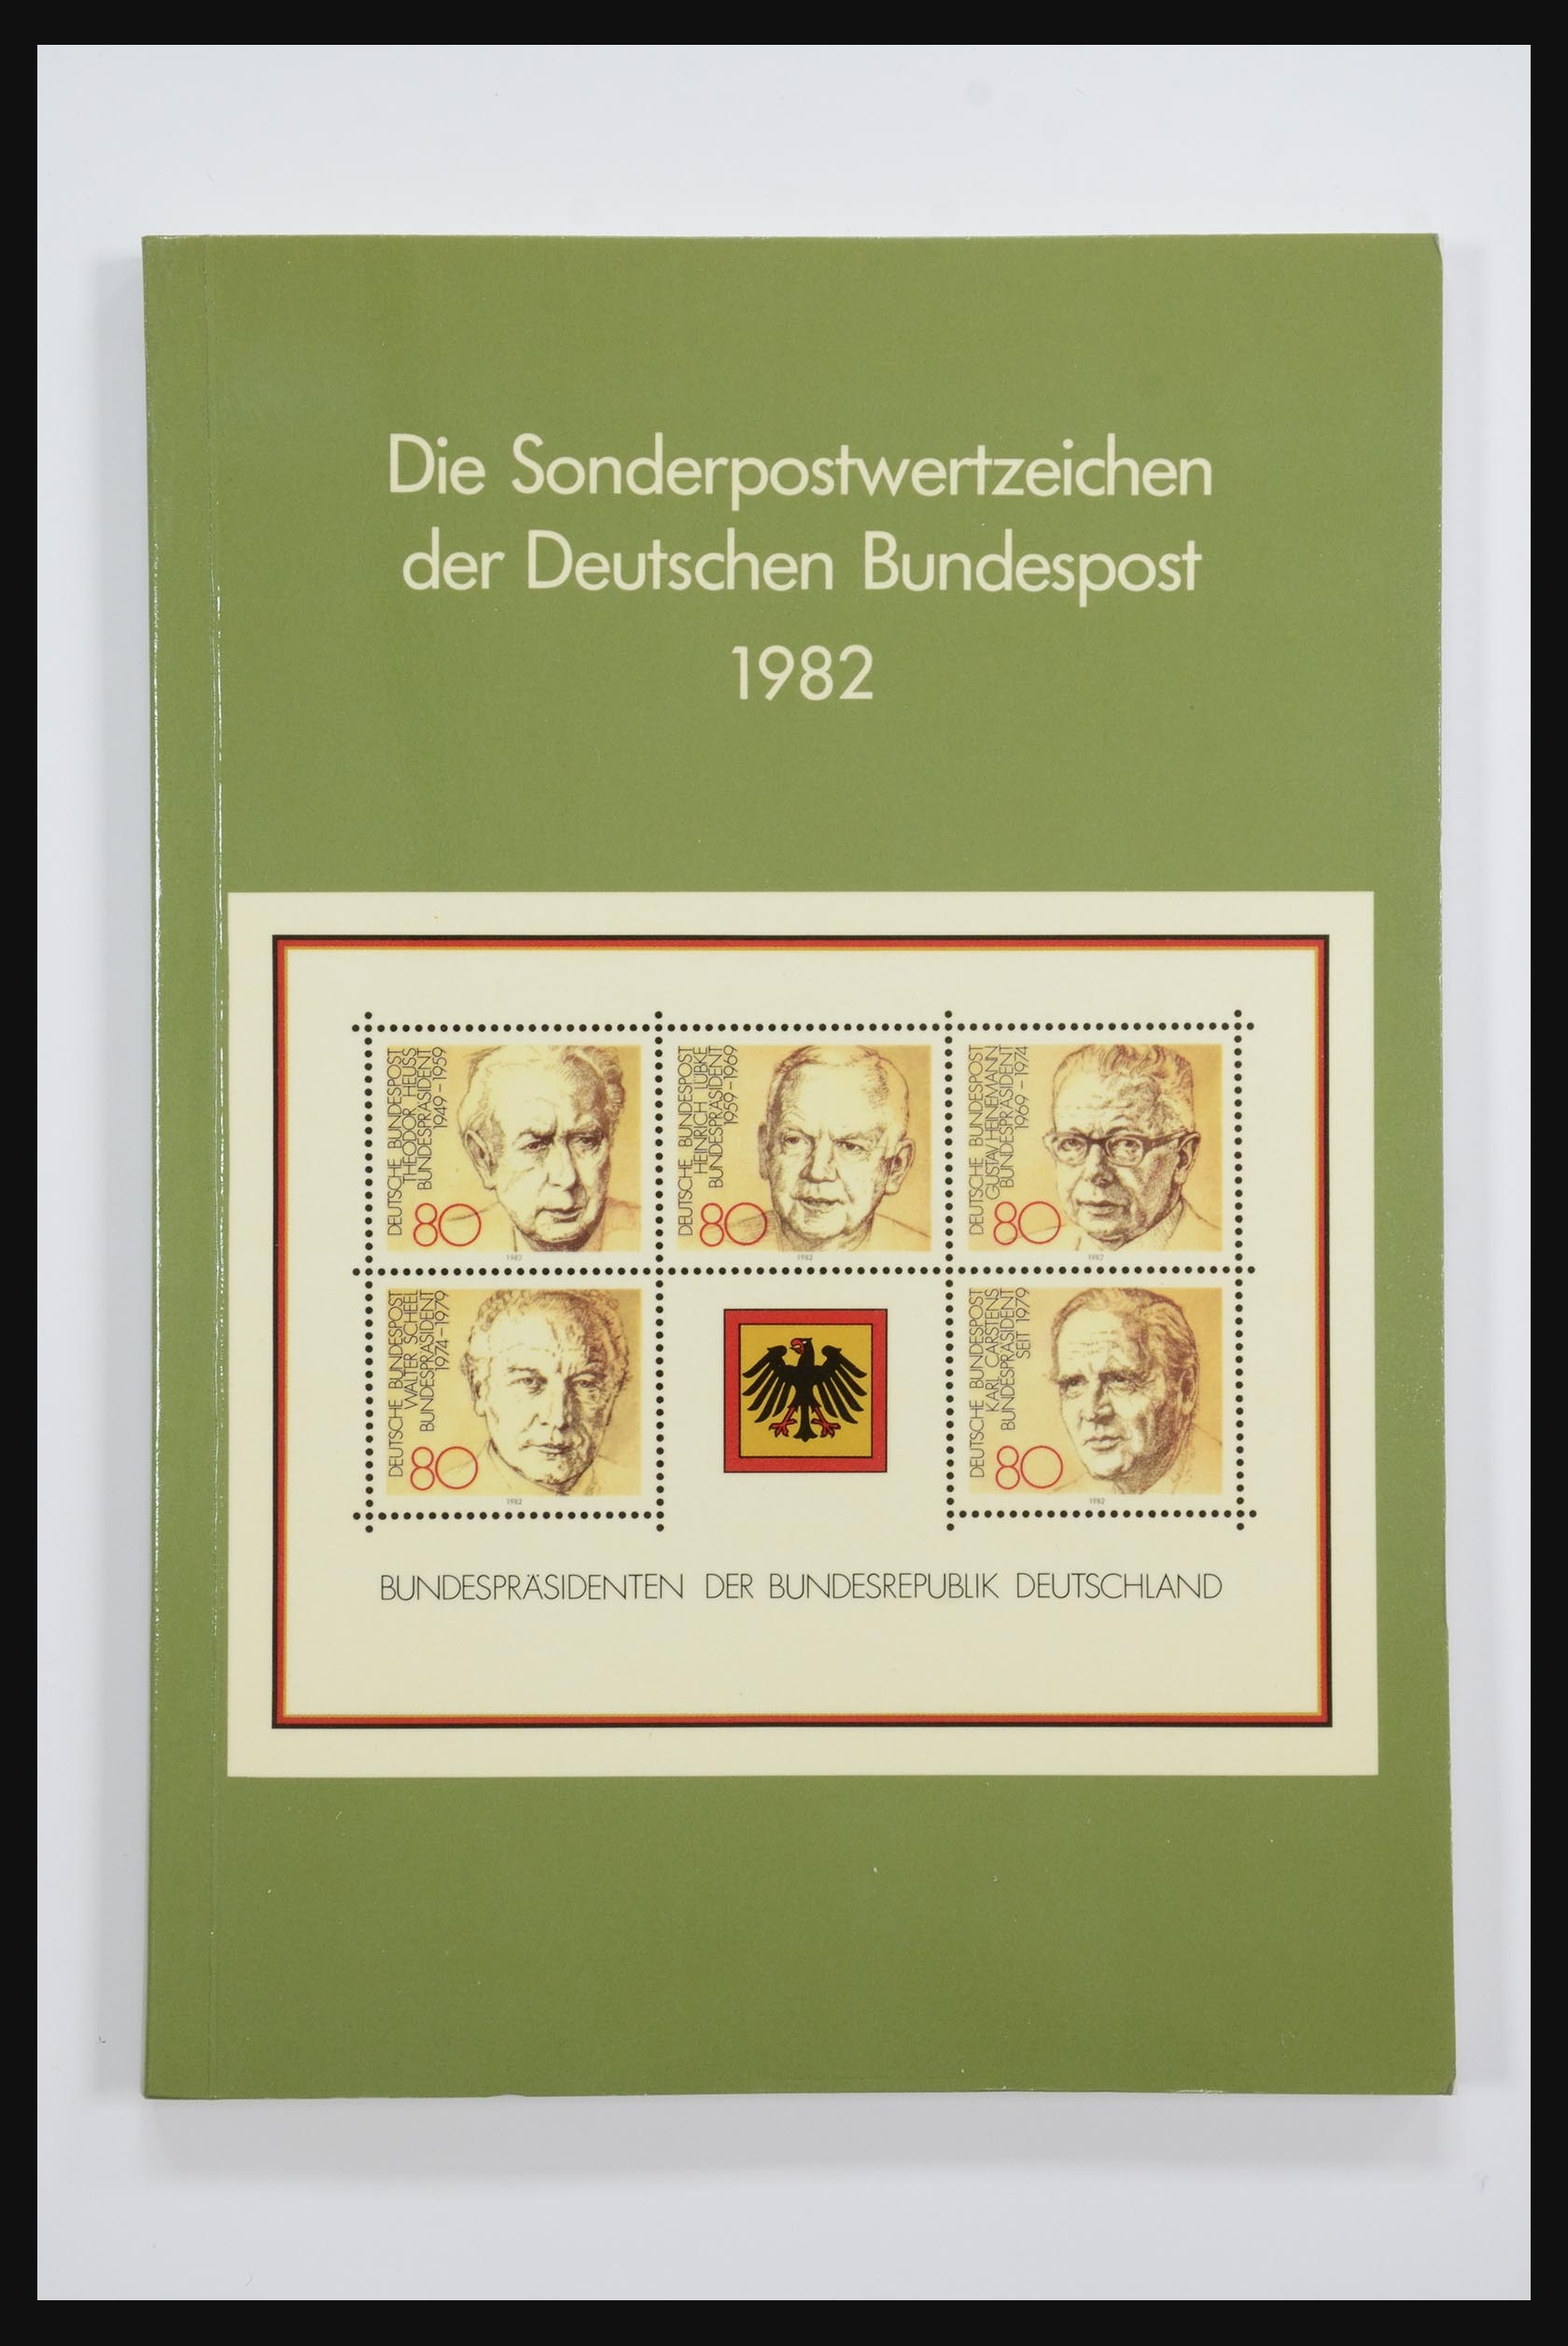 31834 010 - 31834 Bundespost yearbooks 1973(!)-1999.